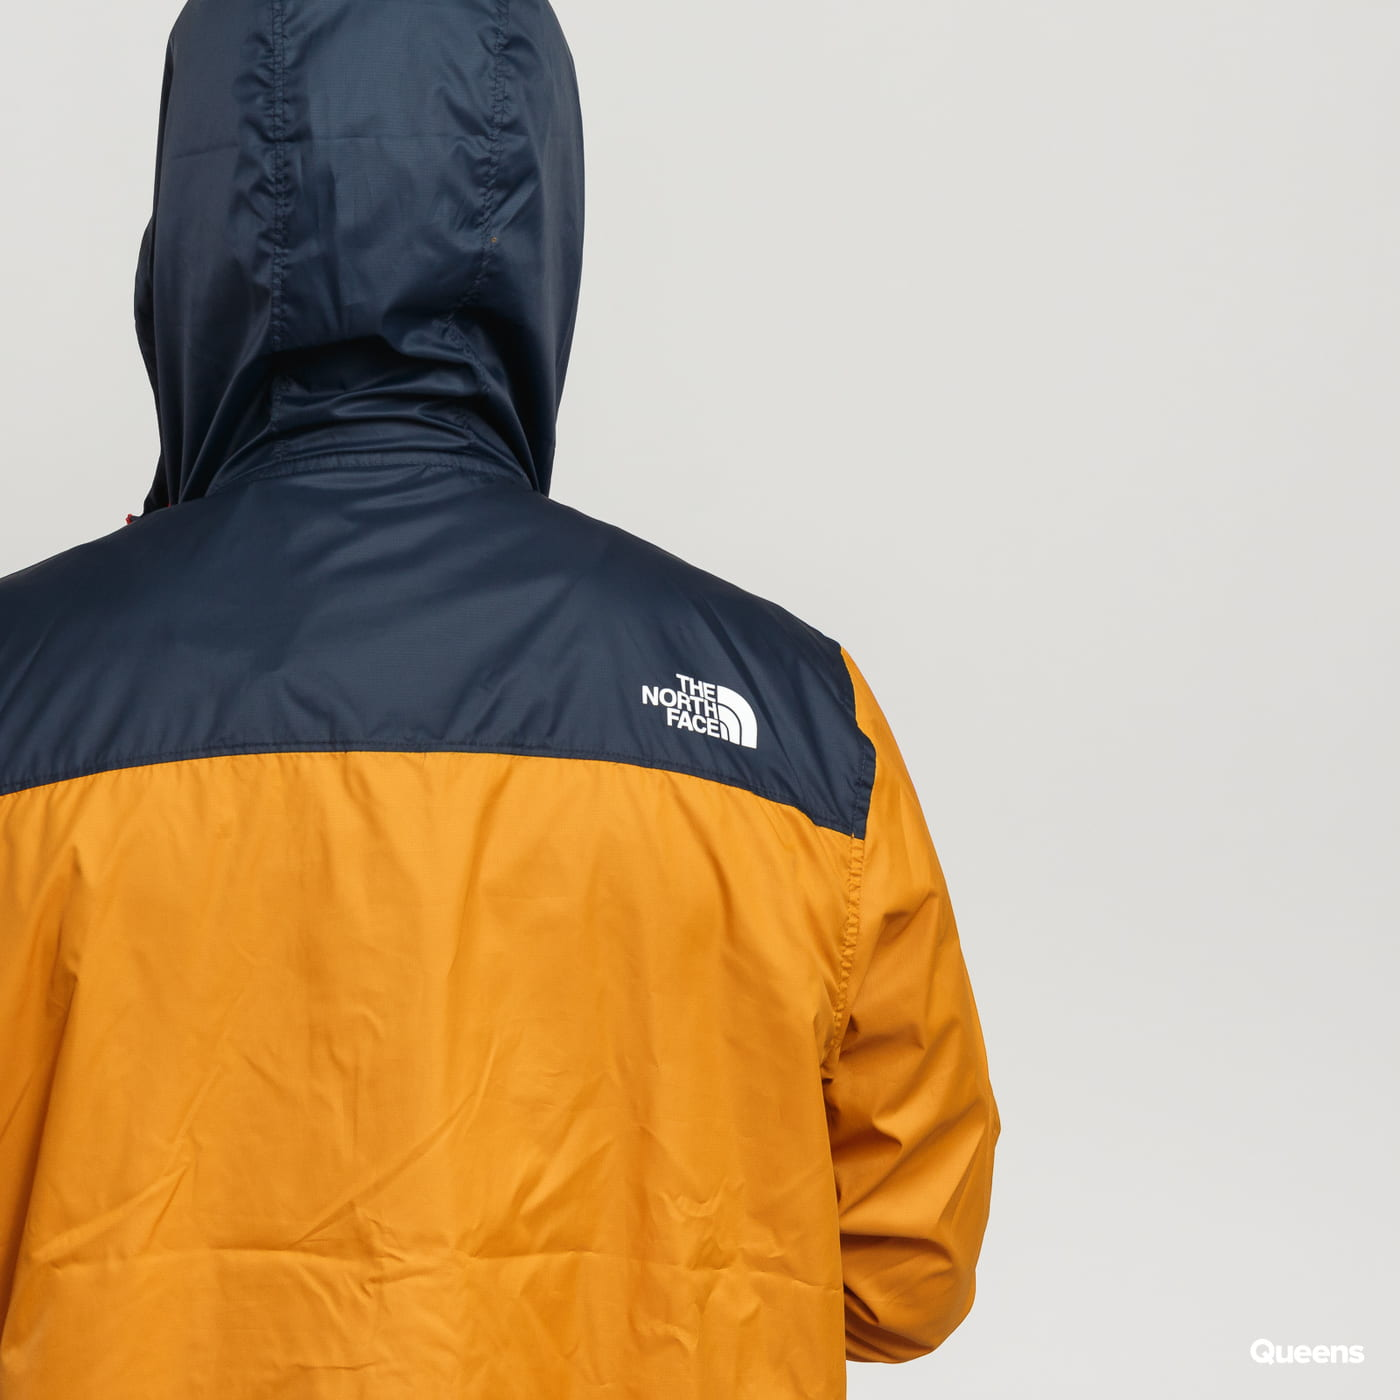 The North Face M 1990 SE Mountain Jacket orange / navy